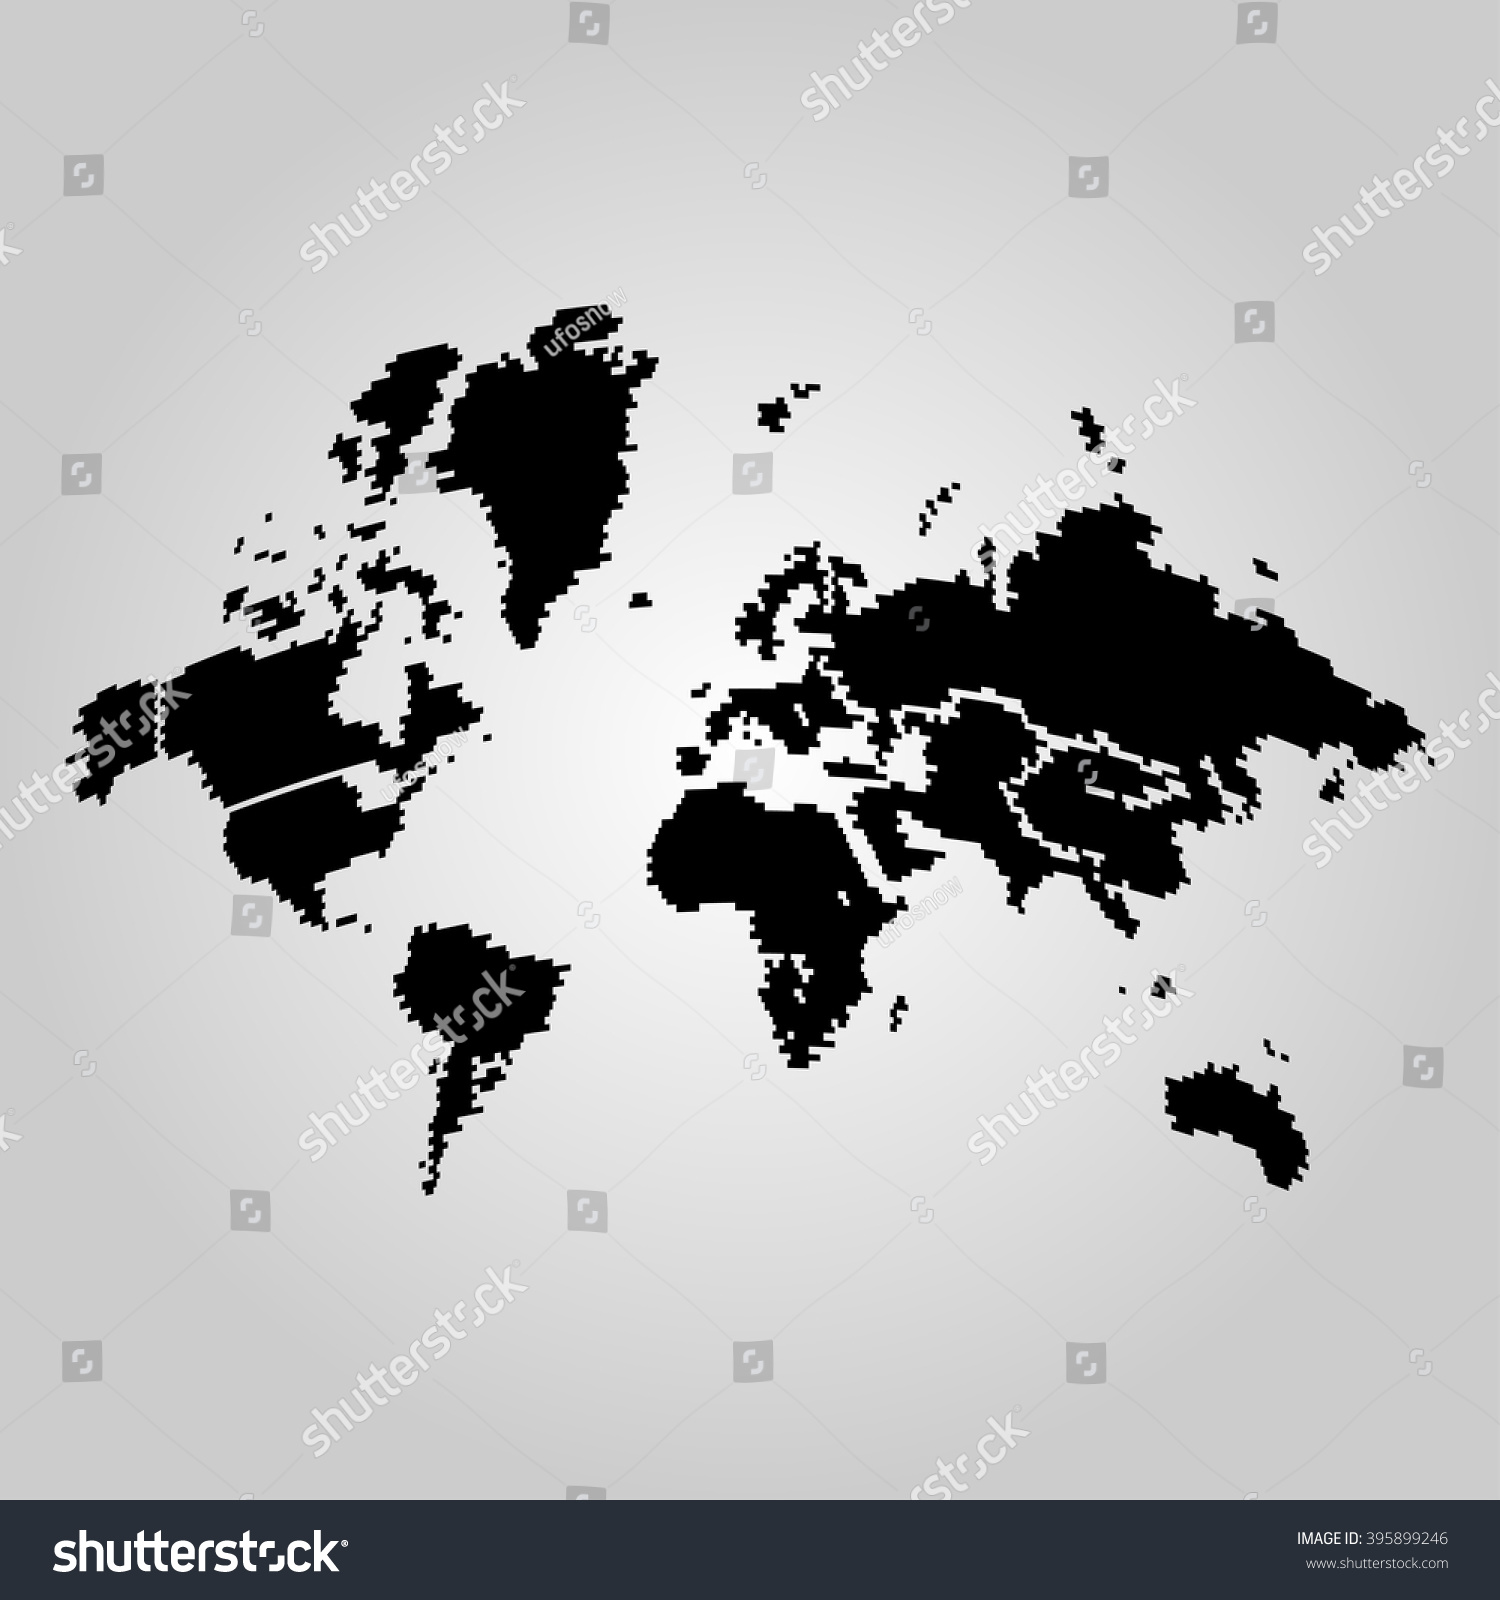 Simple black world map stock vector 395899246 shutterstock simple black world map gumiabroncs Image collections